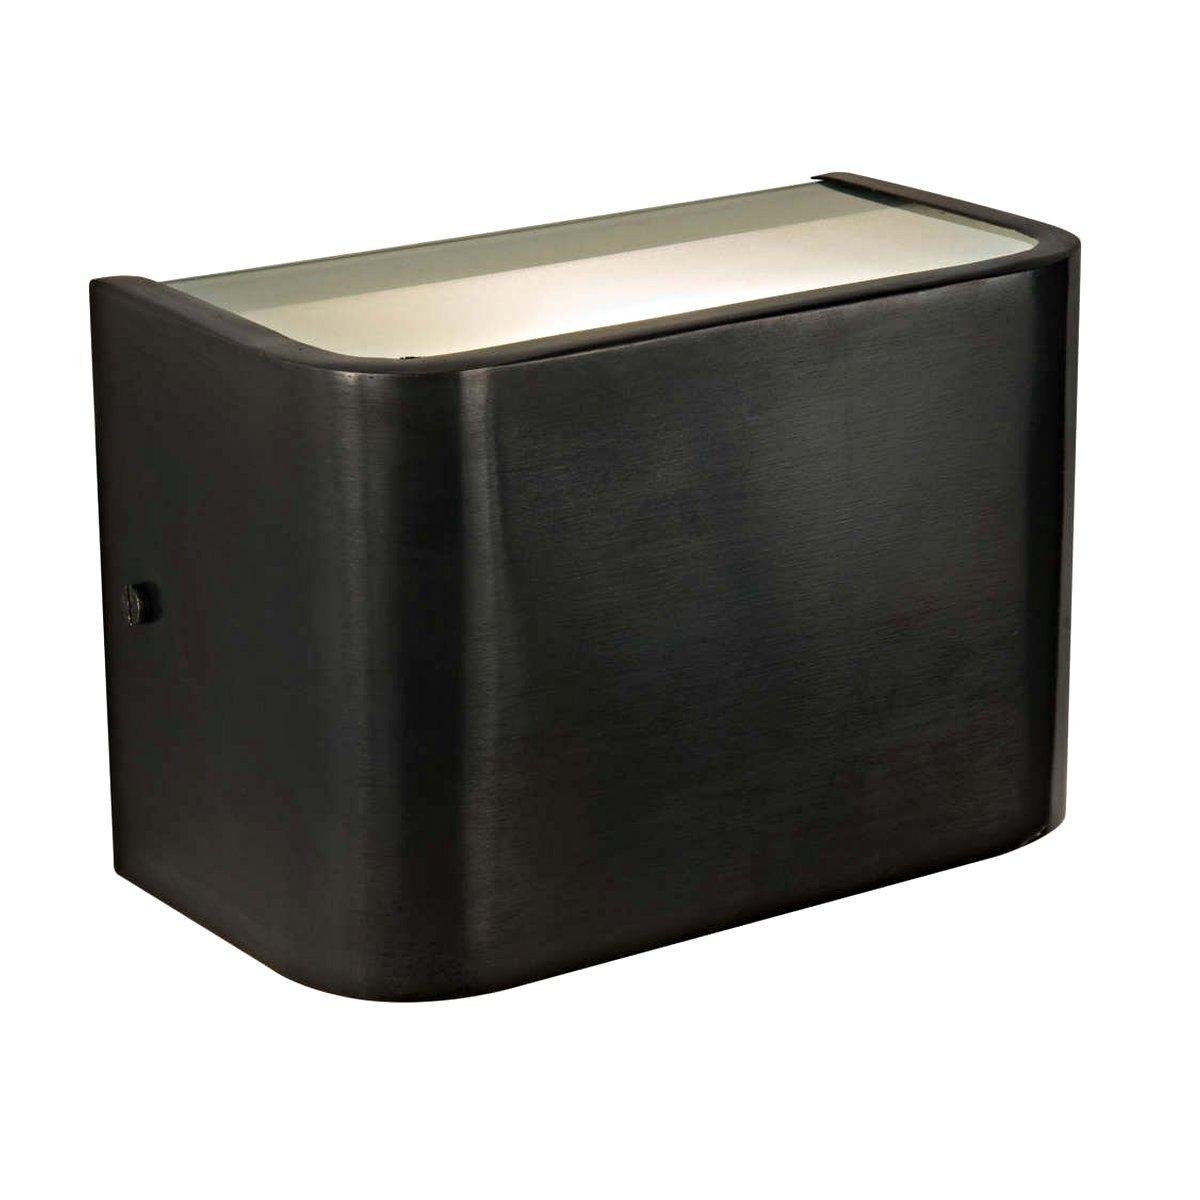 kleiner up and down wandstrahler aus messing vana terra lumi. Black Bedroom Furniture Sets. Home Design Ideas